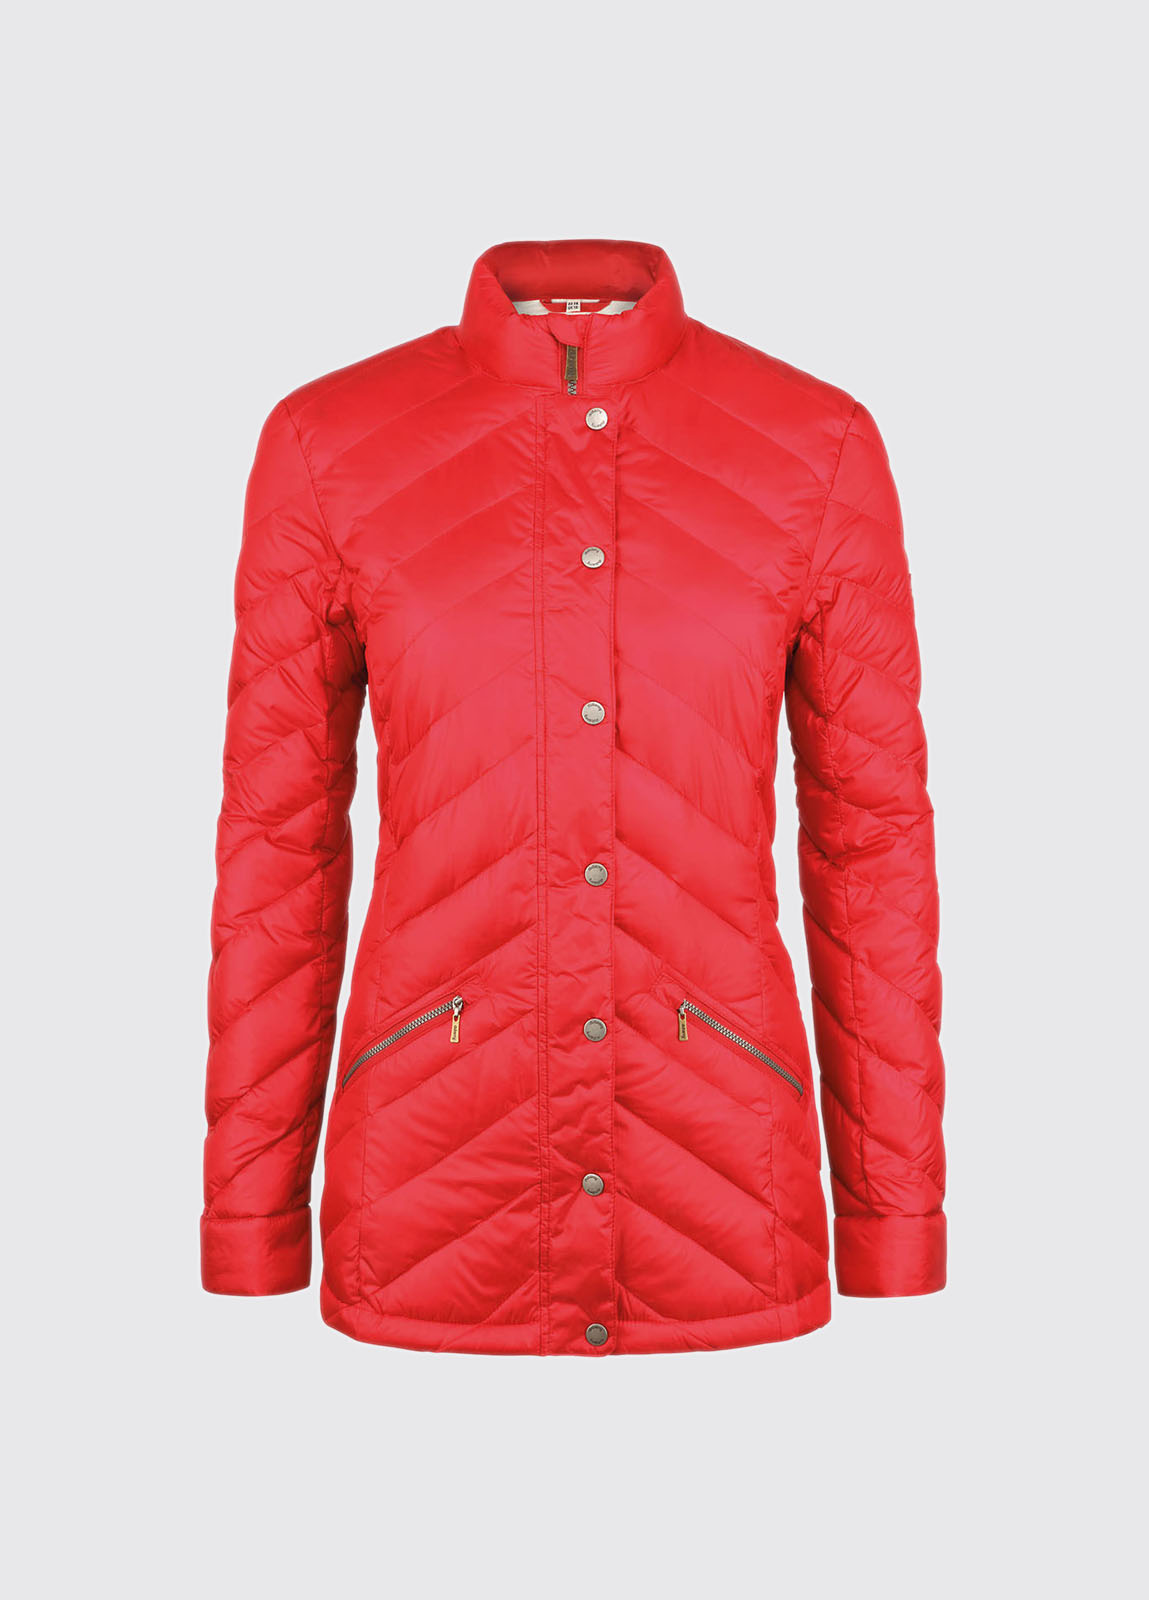 Binchy Women's Down Filled Jacket - Red